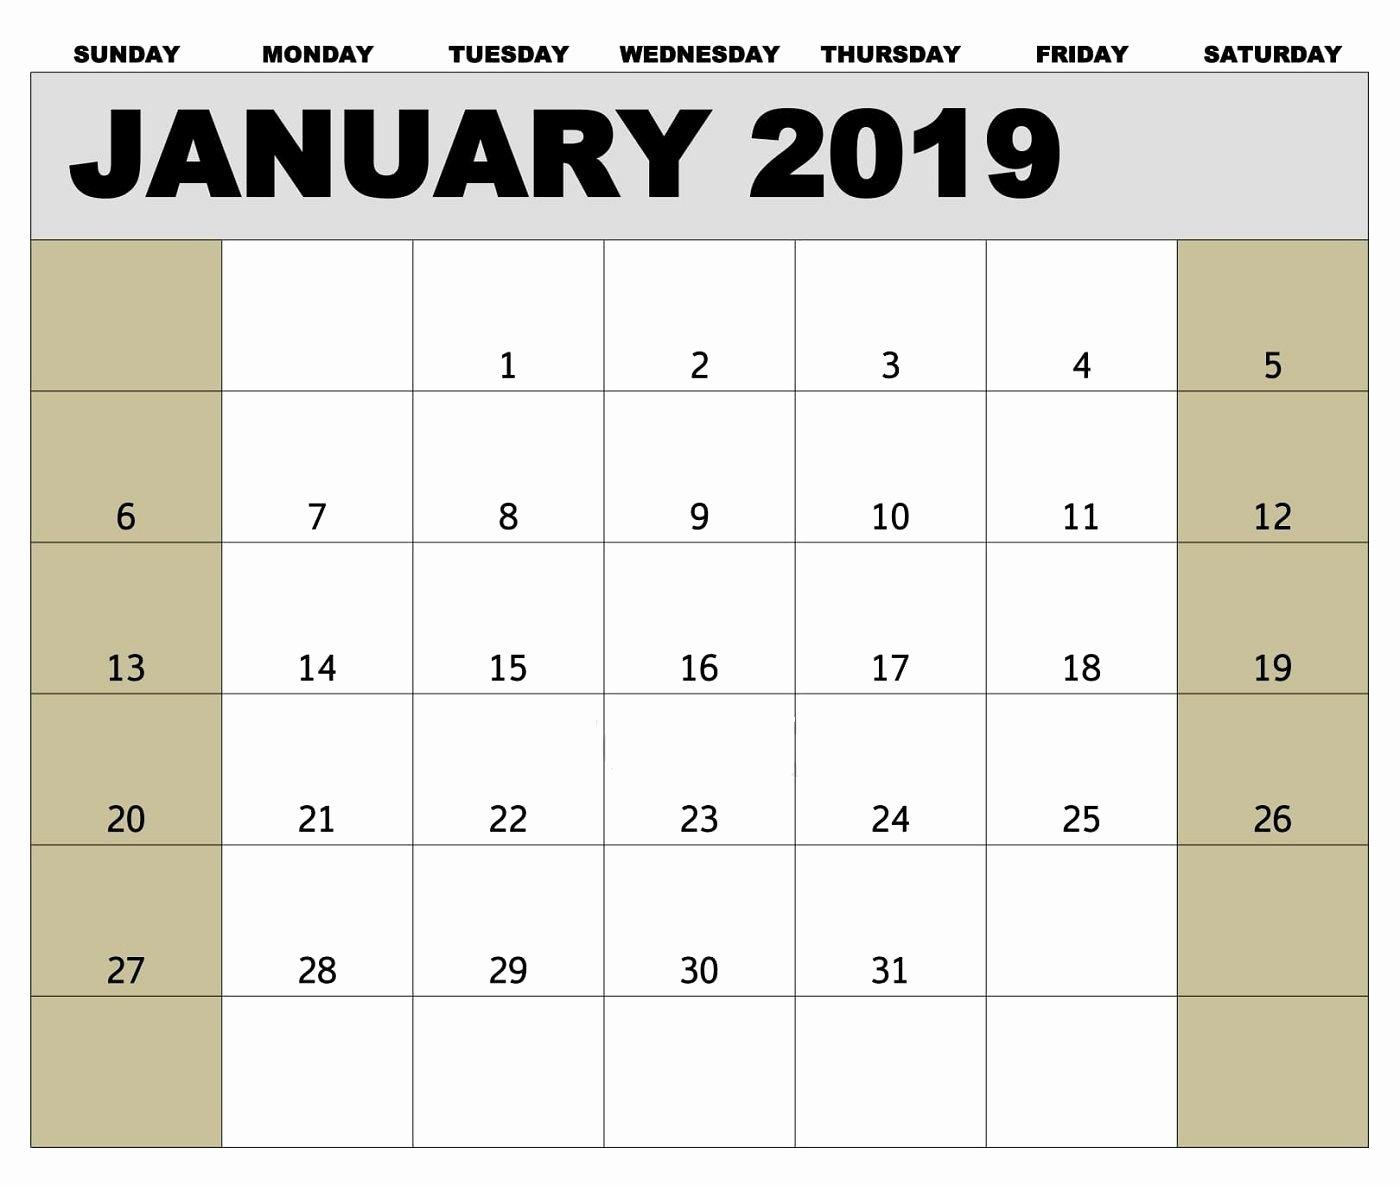 2019 Biweekly Payroll Calendar Excel Elegant 2019 Payroll Calendar Printable